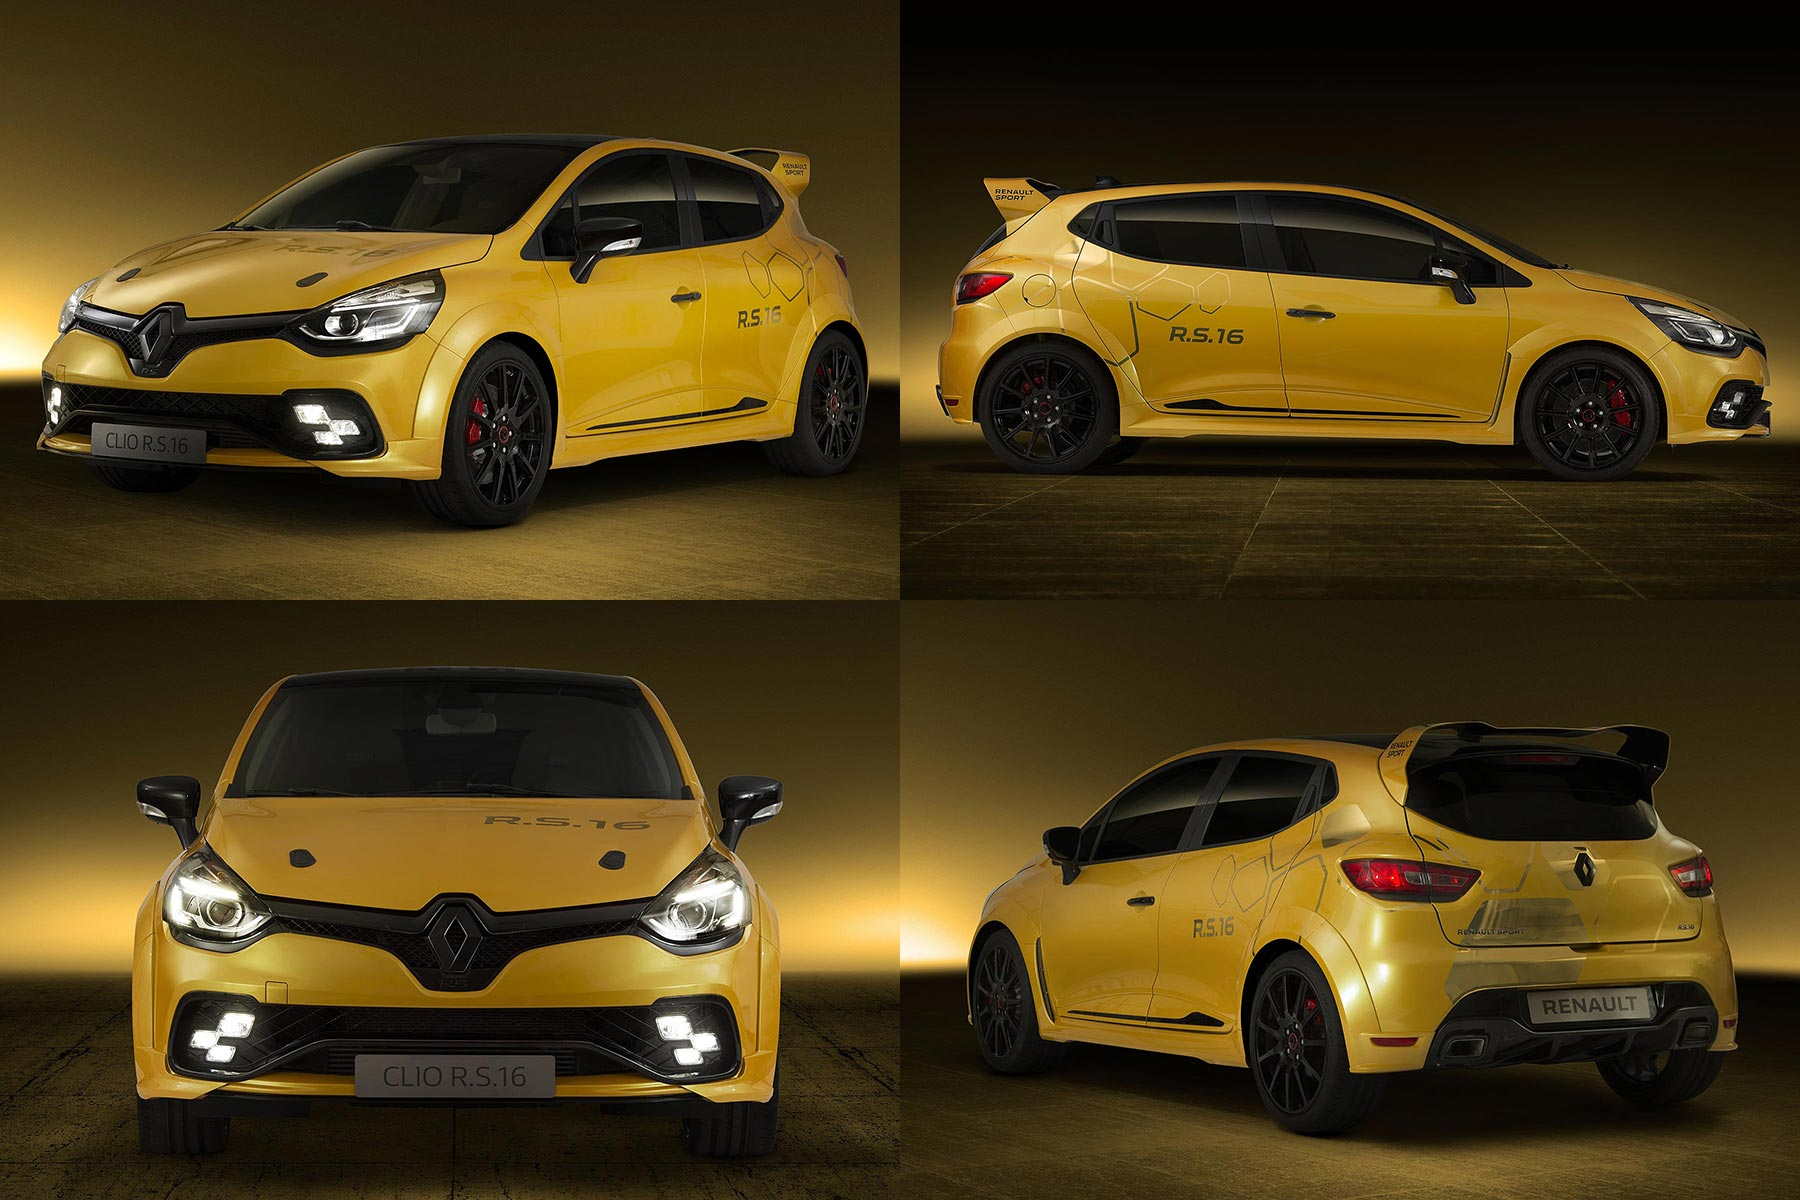 Skunkworks 275hp Renault Clio R.S.16 Wows Monaco Grand